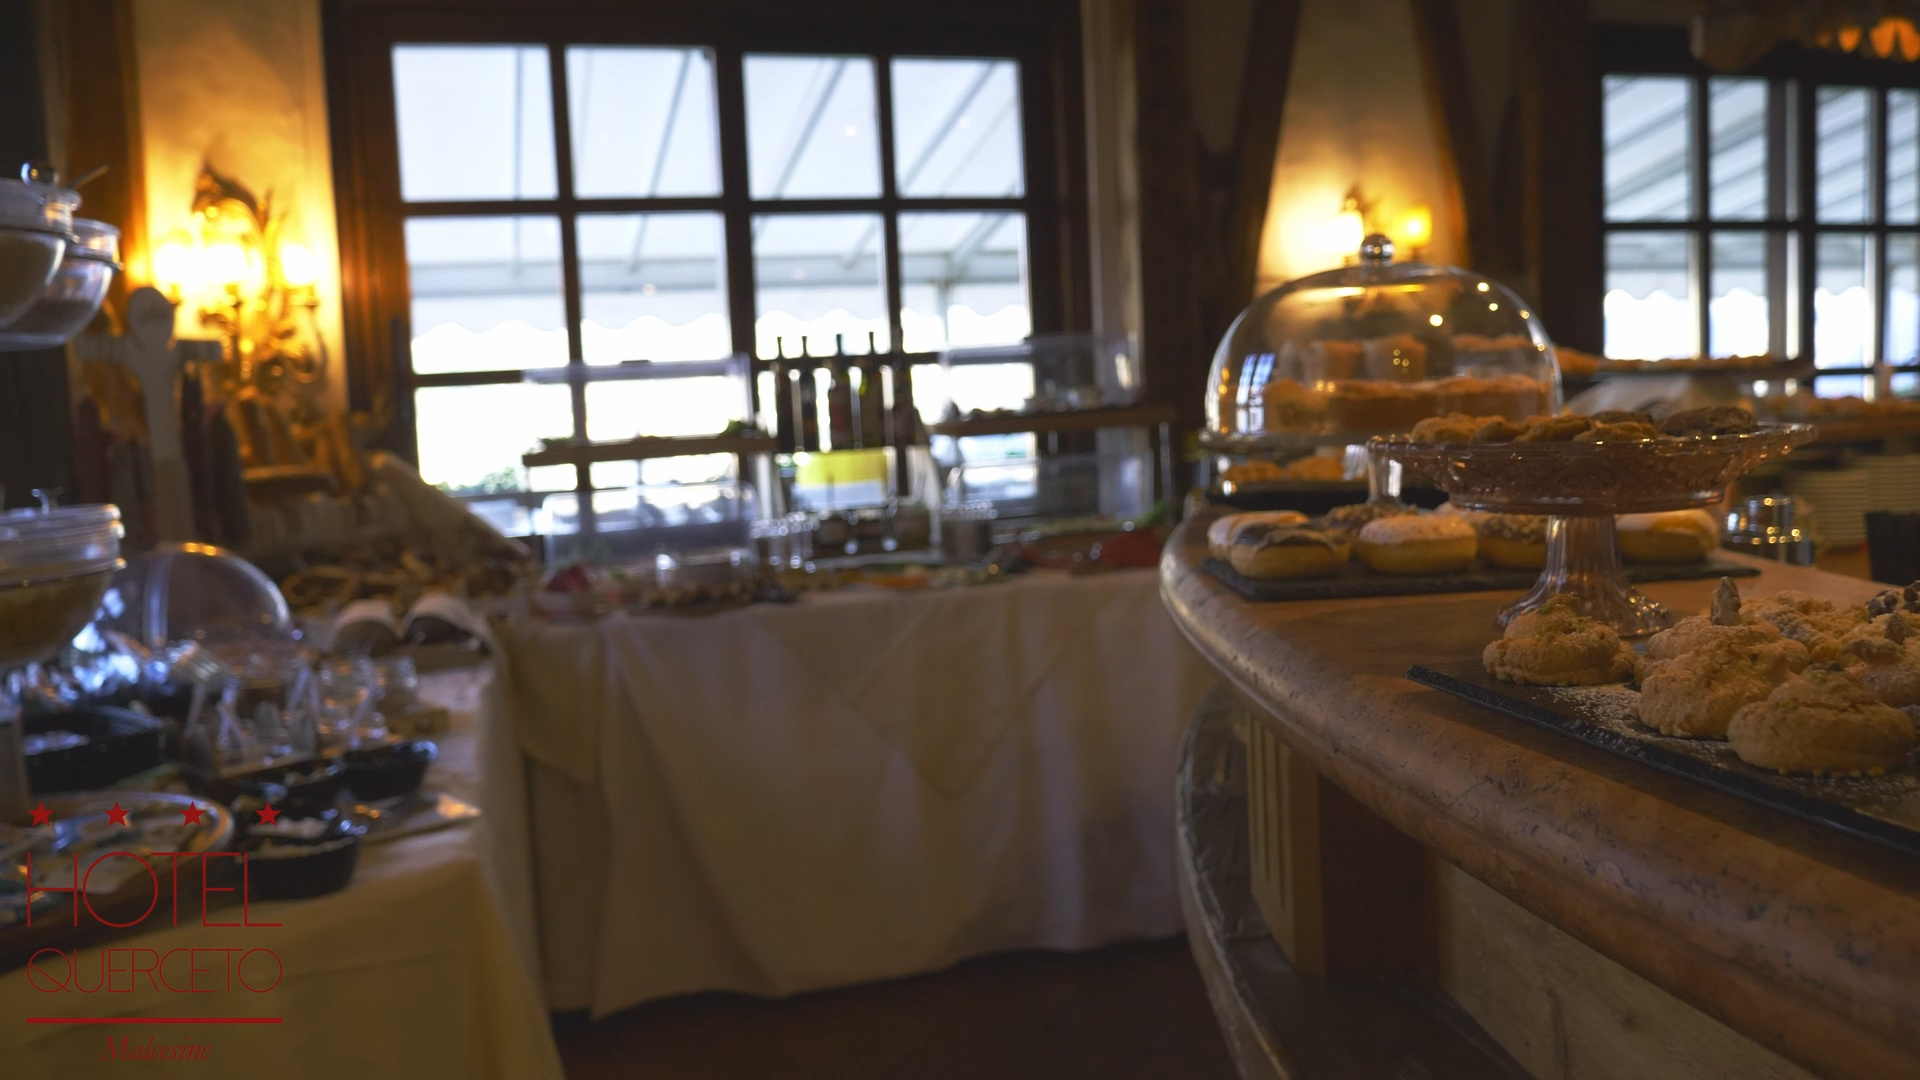 Park Hotel Querceto - Lago di Garda, Malcesine